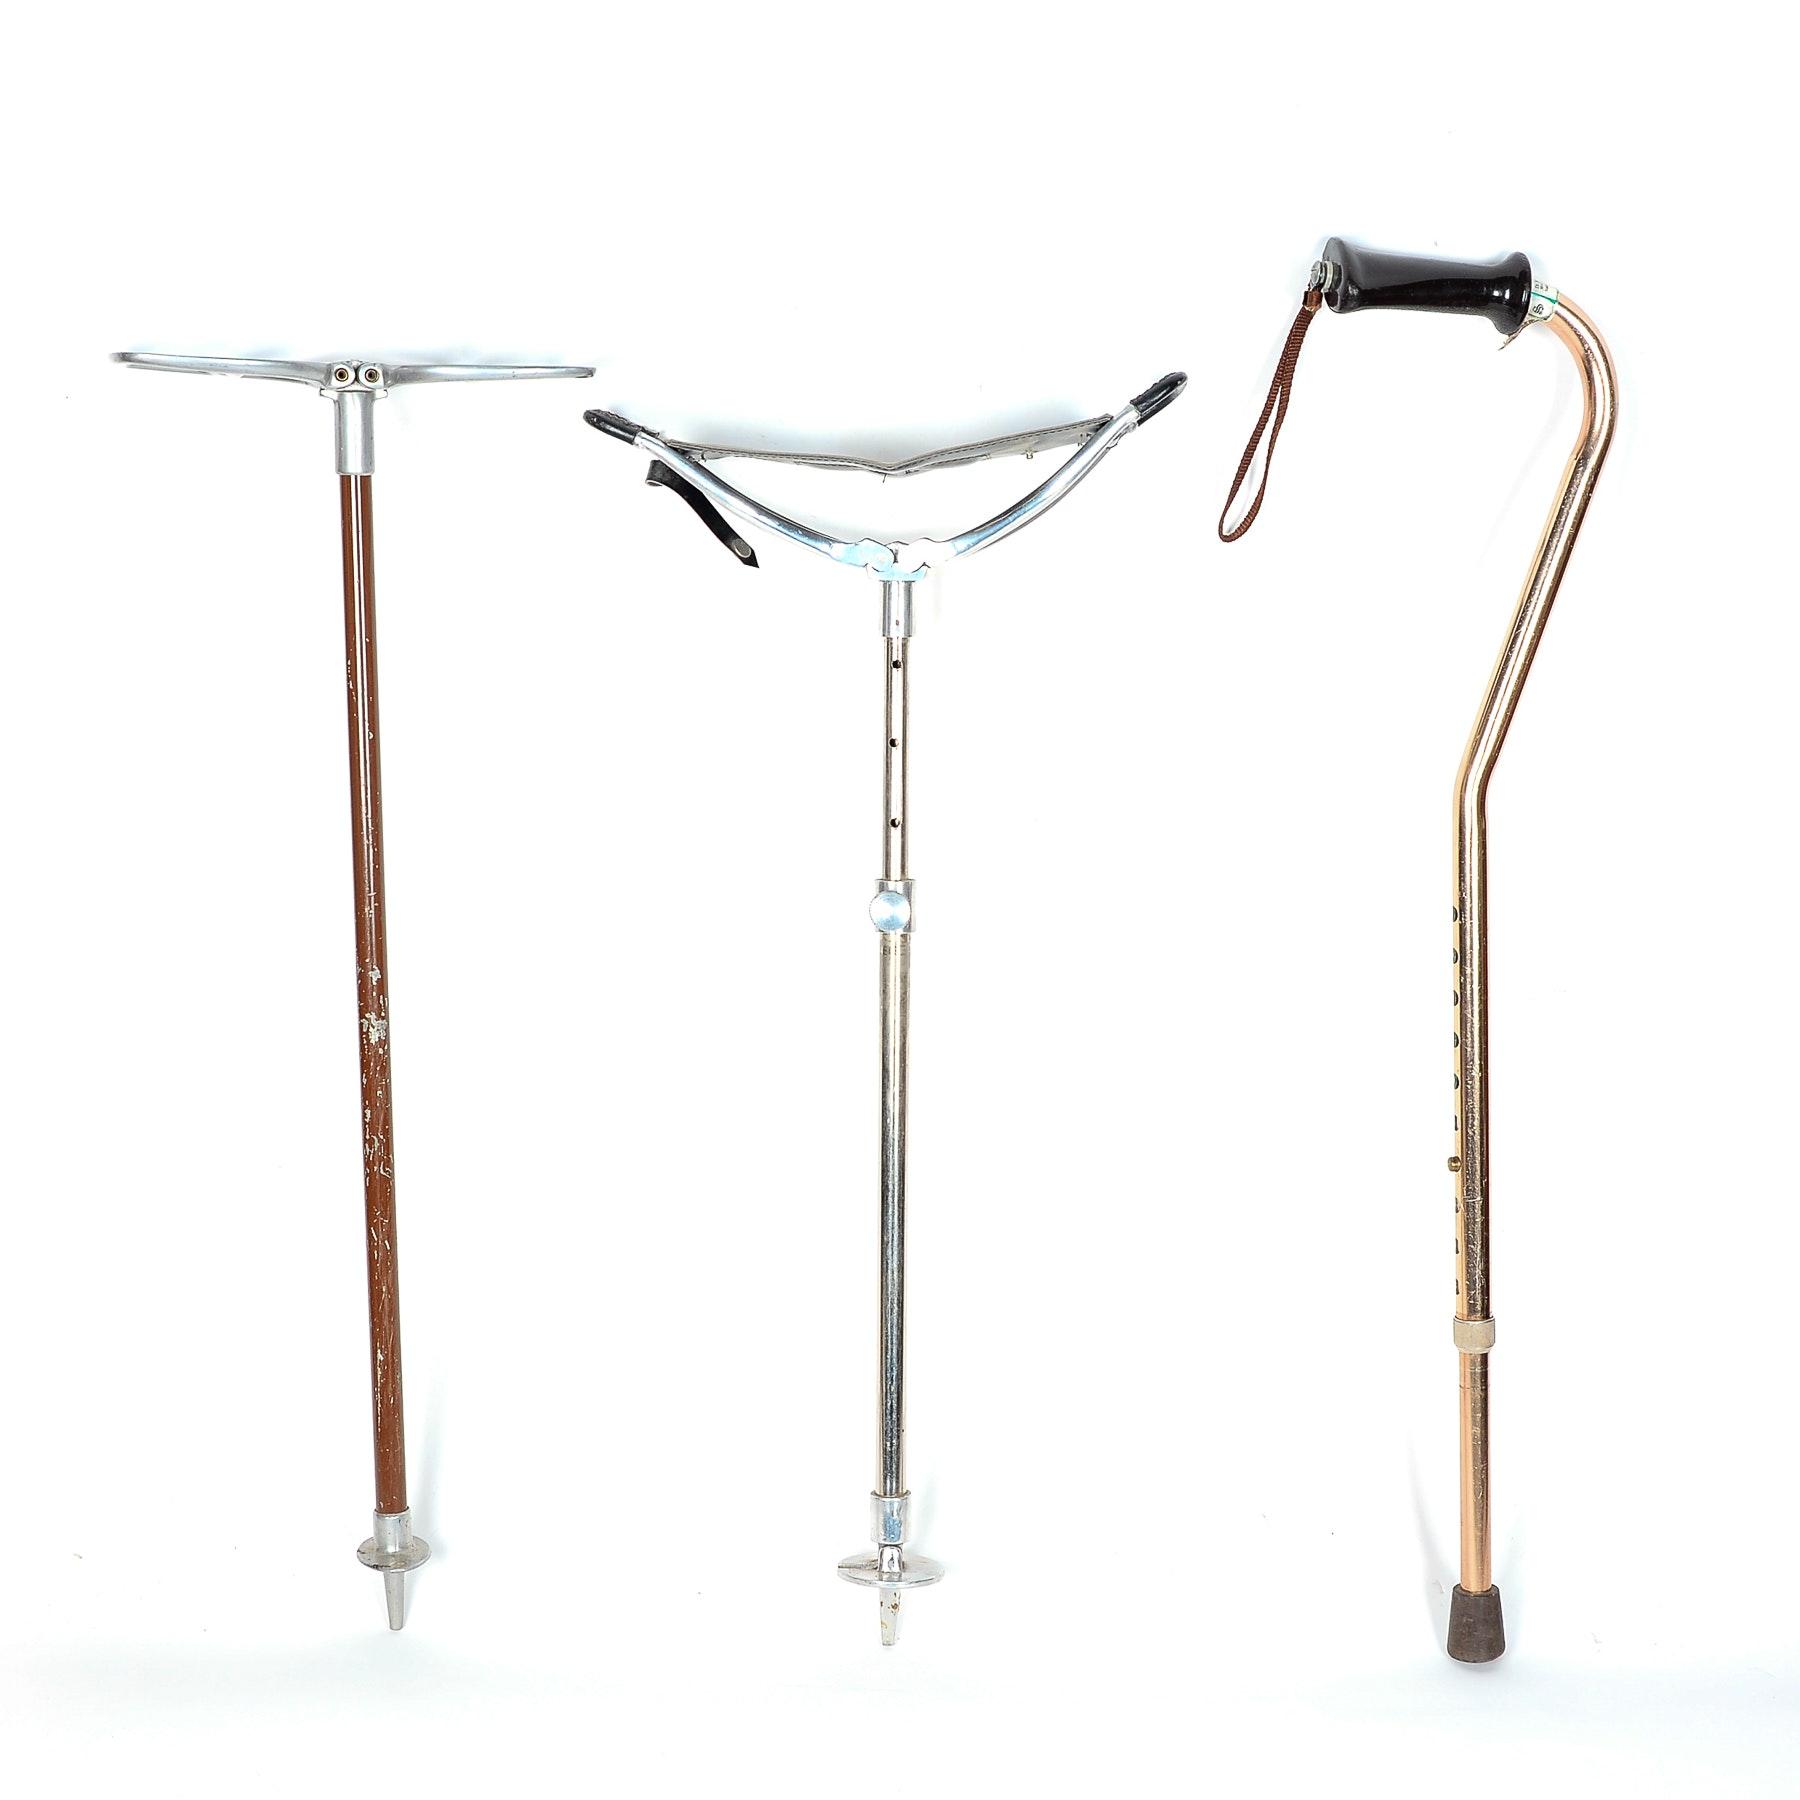 Vintage Portable Seat and Walking Sticks